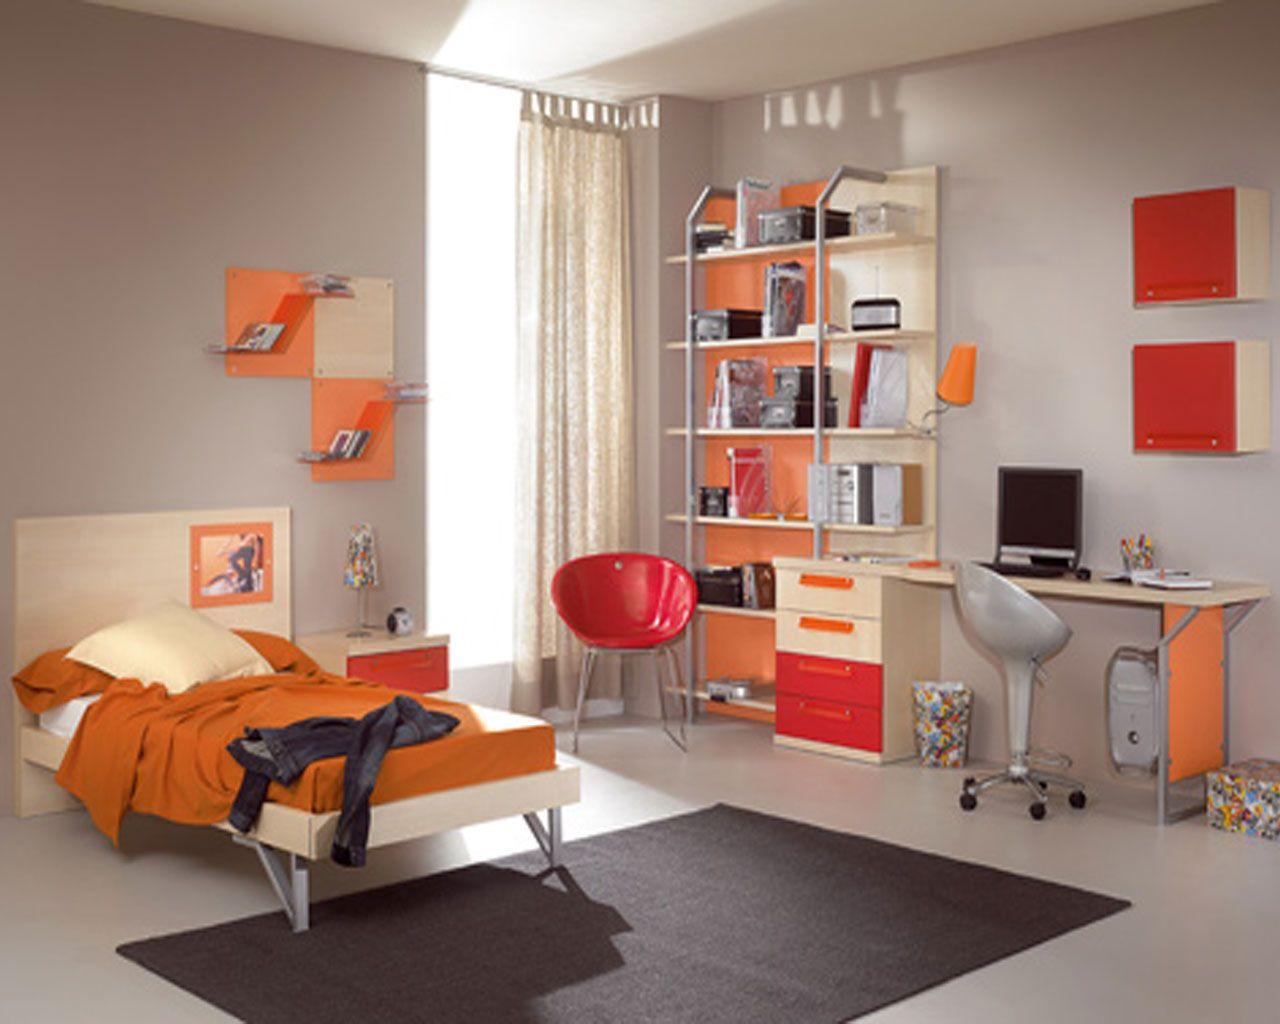 Boys Bedrooms Designs Amazing Image Result For Orange Bedrooms For Kids  Jakes Bedroom 2018